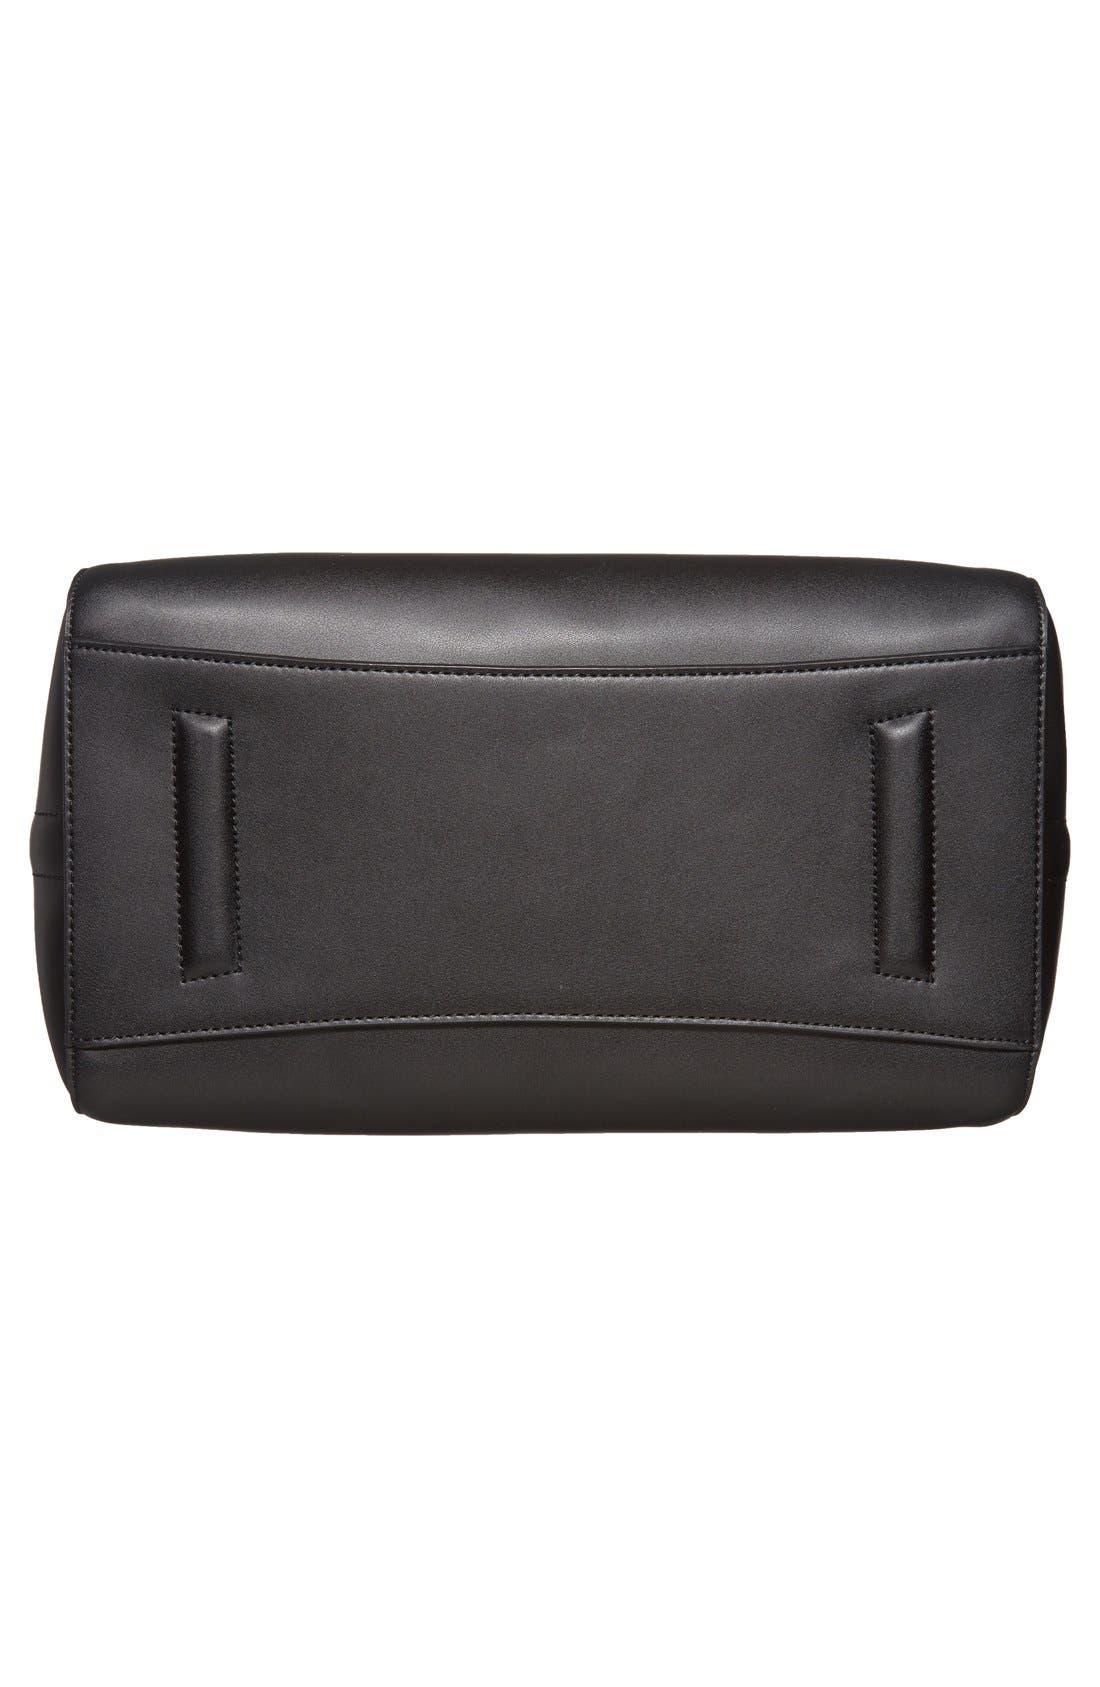 'Medium Antigona' Leather Satchel,                             Alternate thumbnail 6, color,                             Black